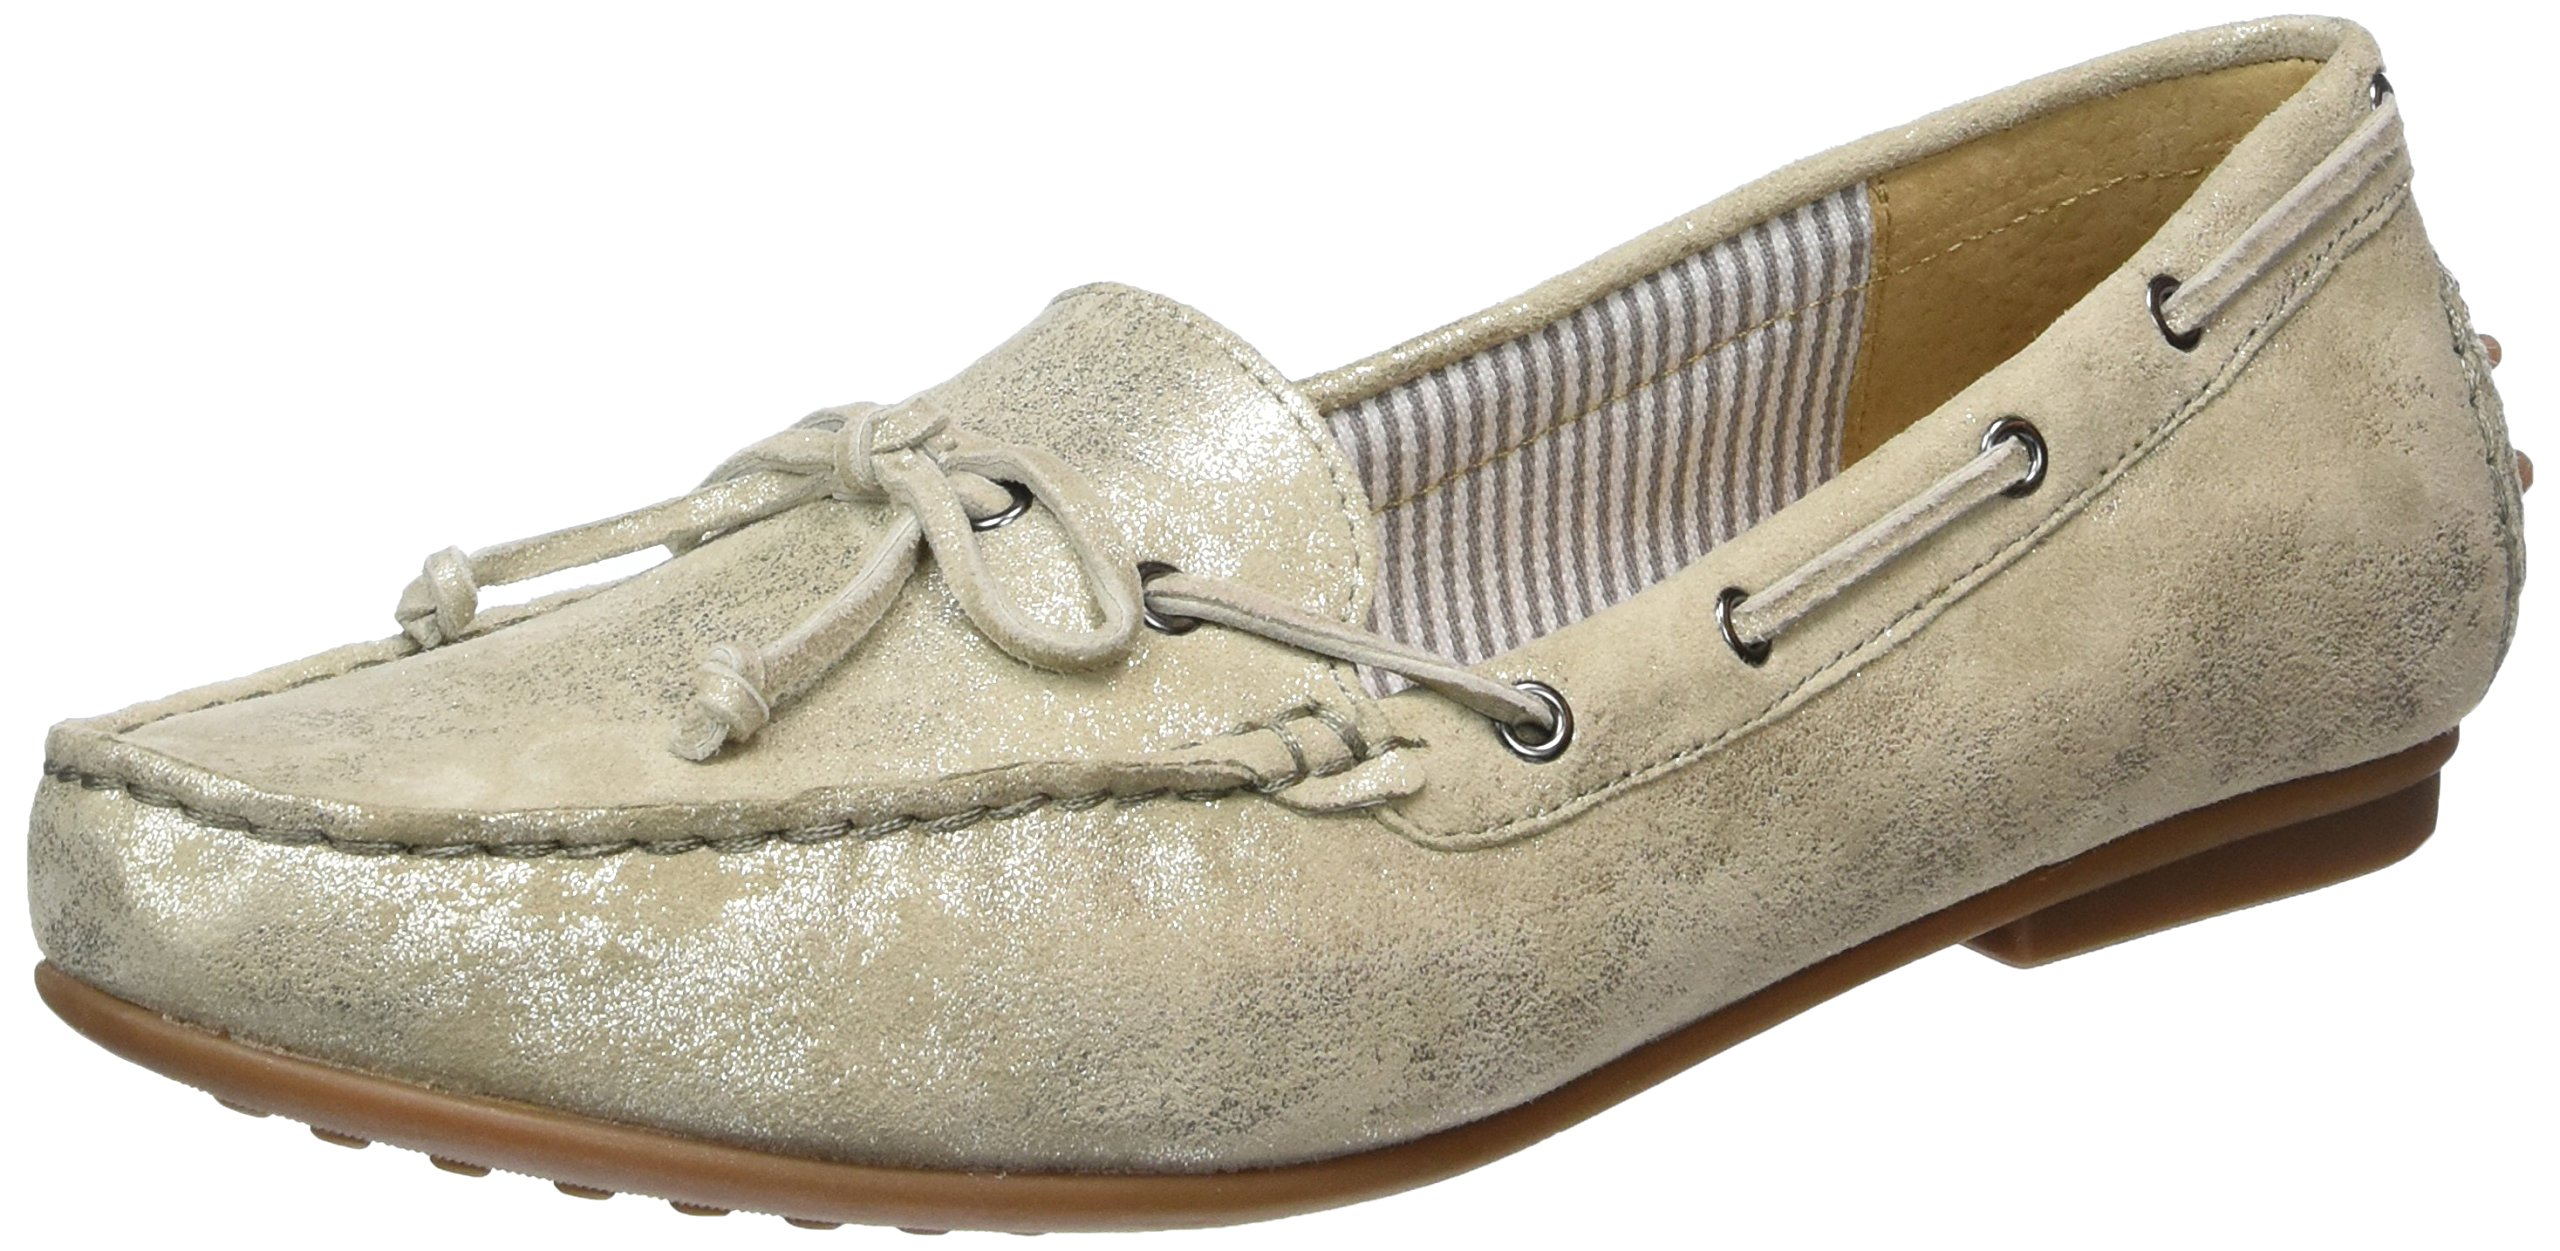 Gabor GaborMocassins Shoes FemmeBraun62 Visone40 5 Eu QrhtCxBosd